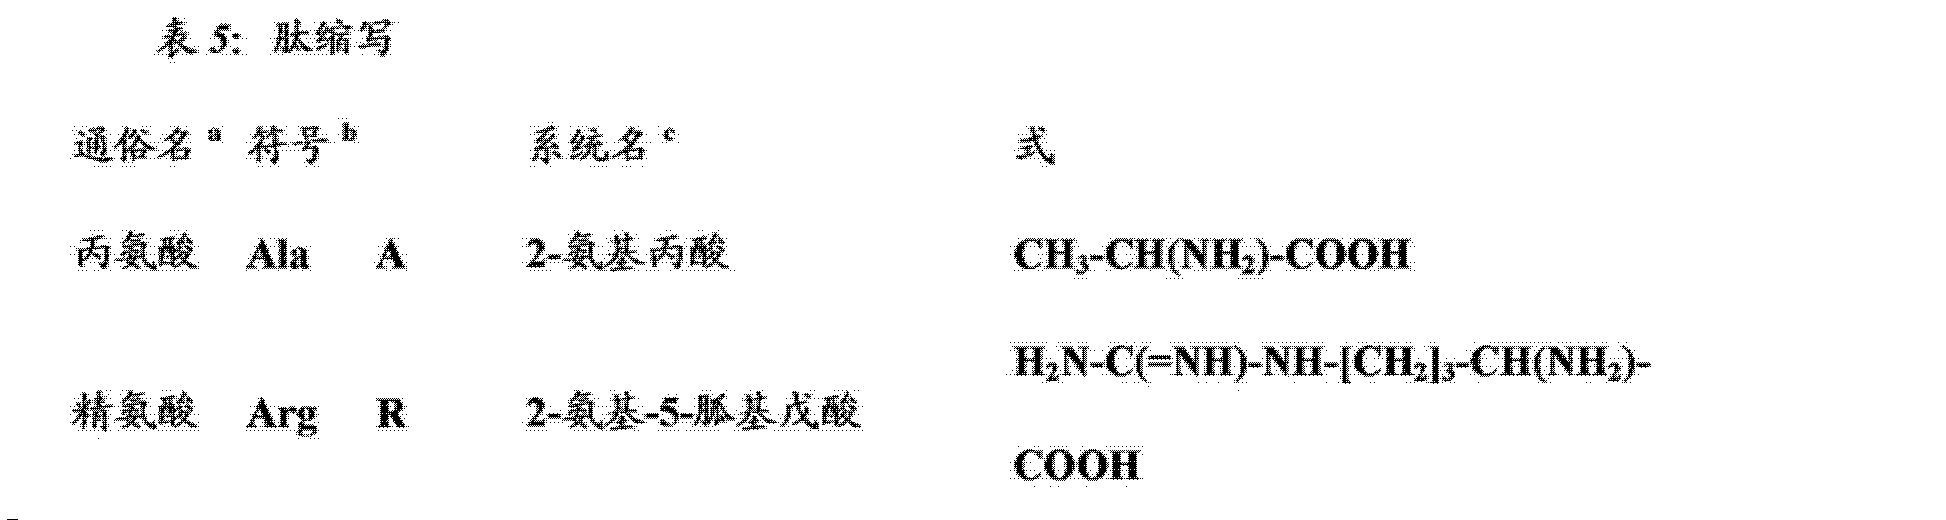 Figure CN103747782AD00641